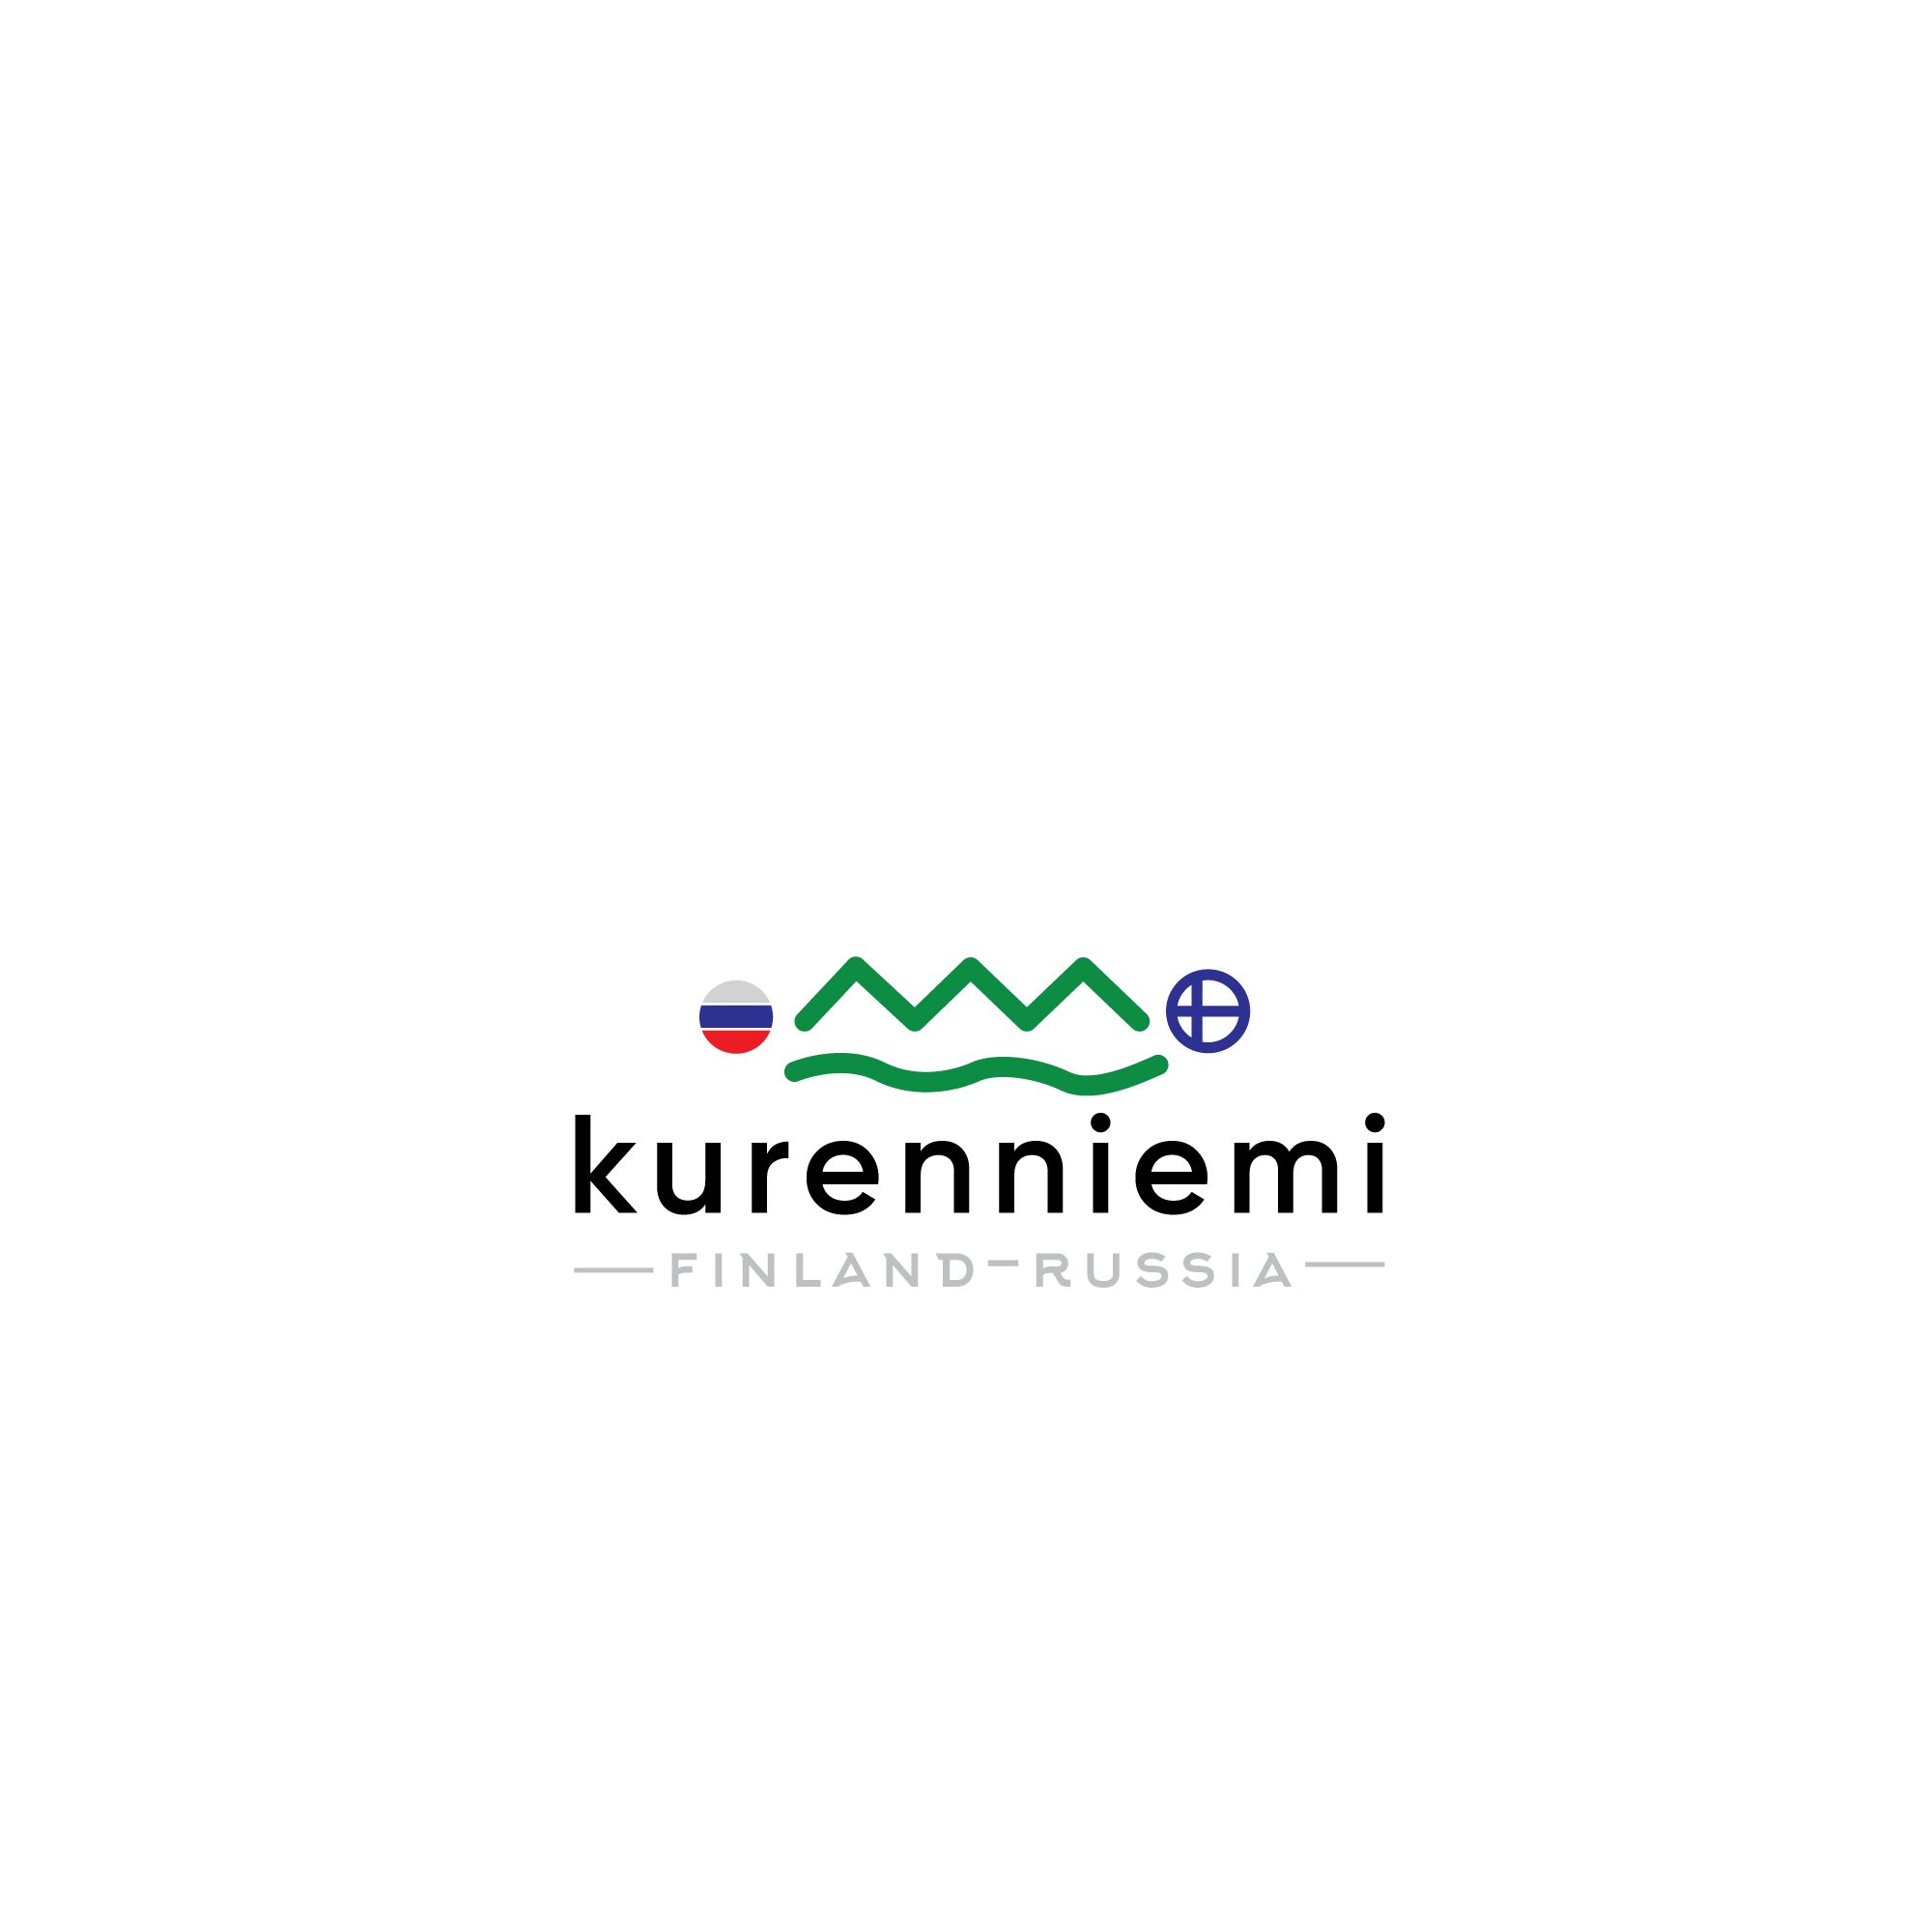 Логотип для Kurenniemi, FinAgRu-nat, Finland-Russia - дизайнер SmolinDenis